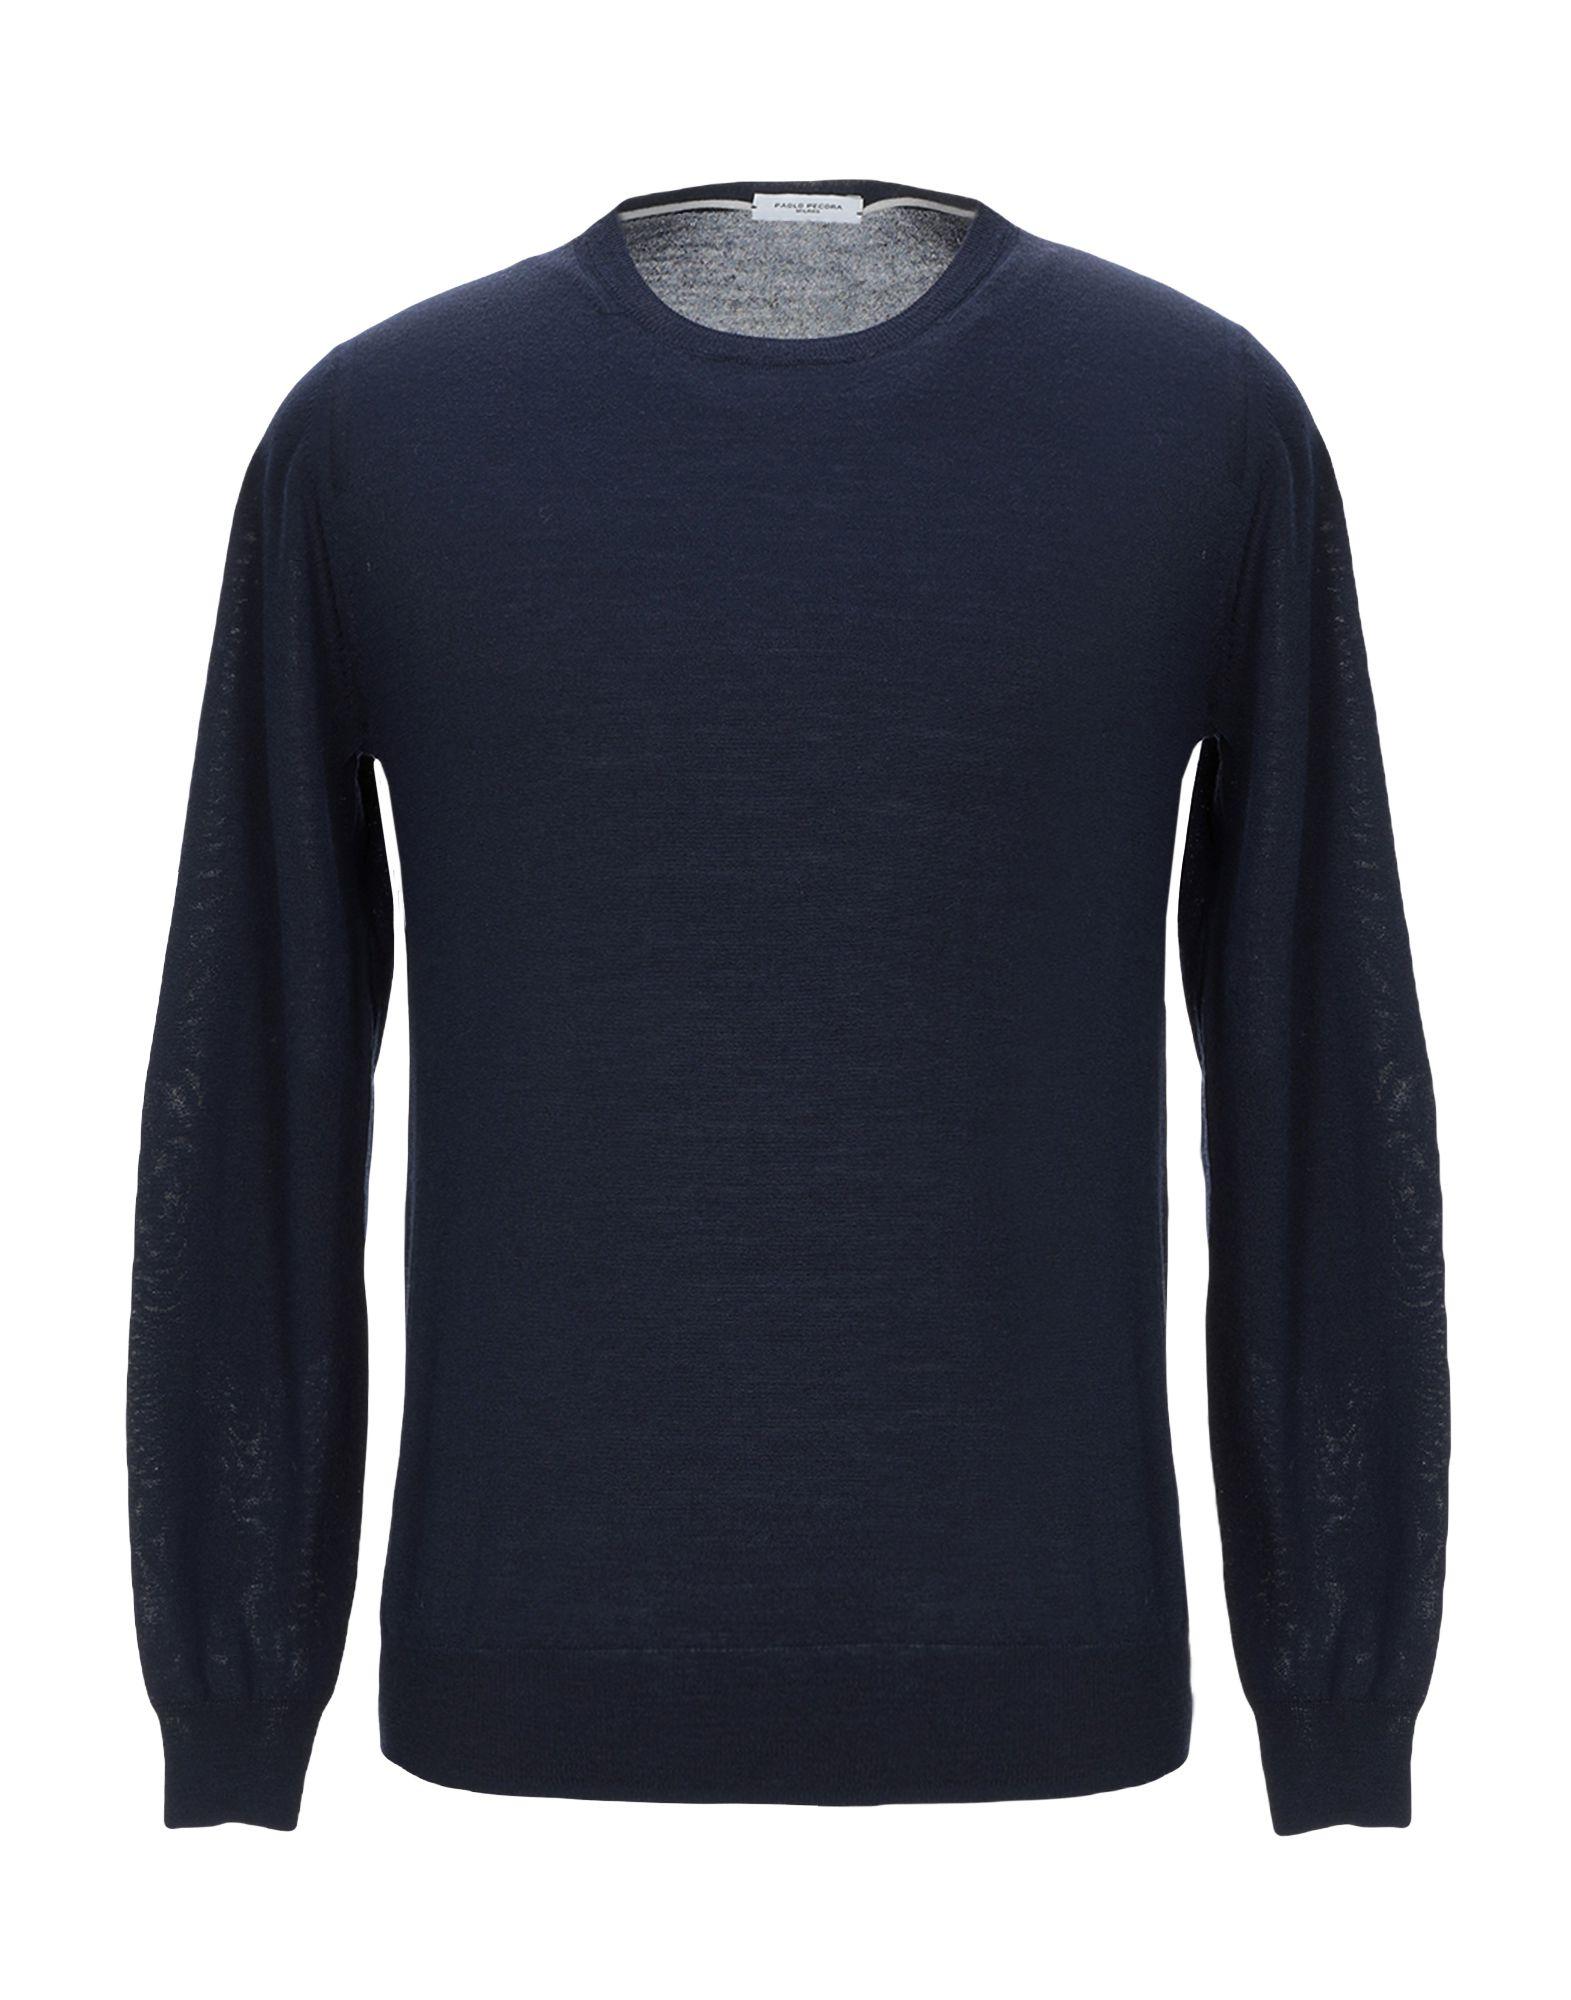 PAOLO PECORA Sweaters - Item 39983419